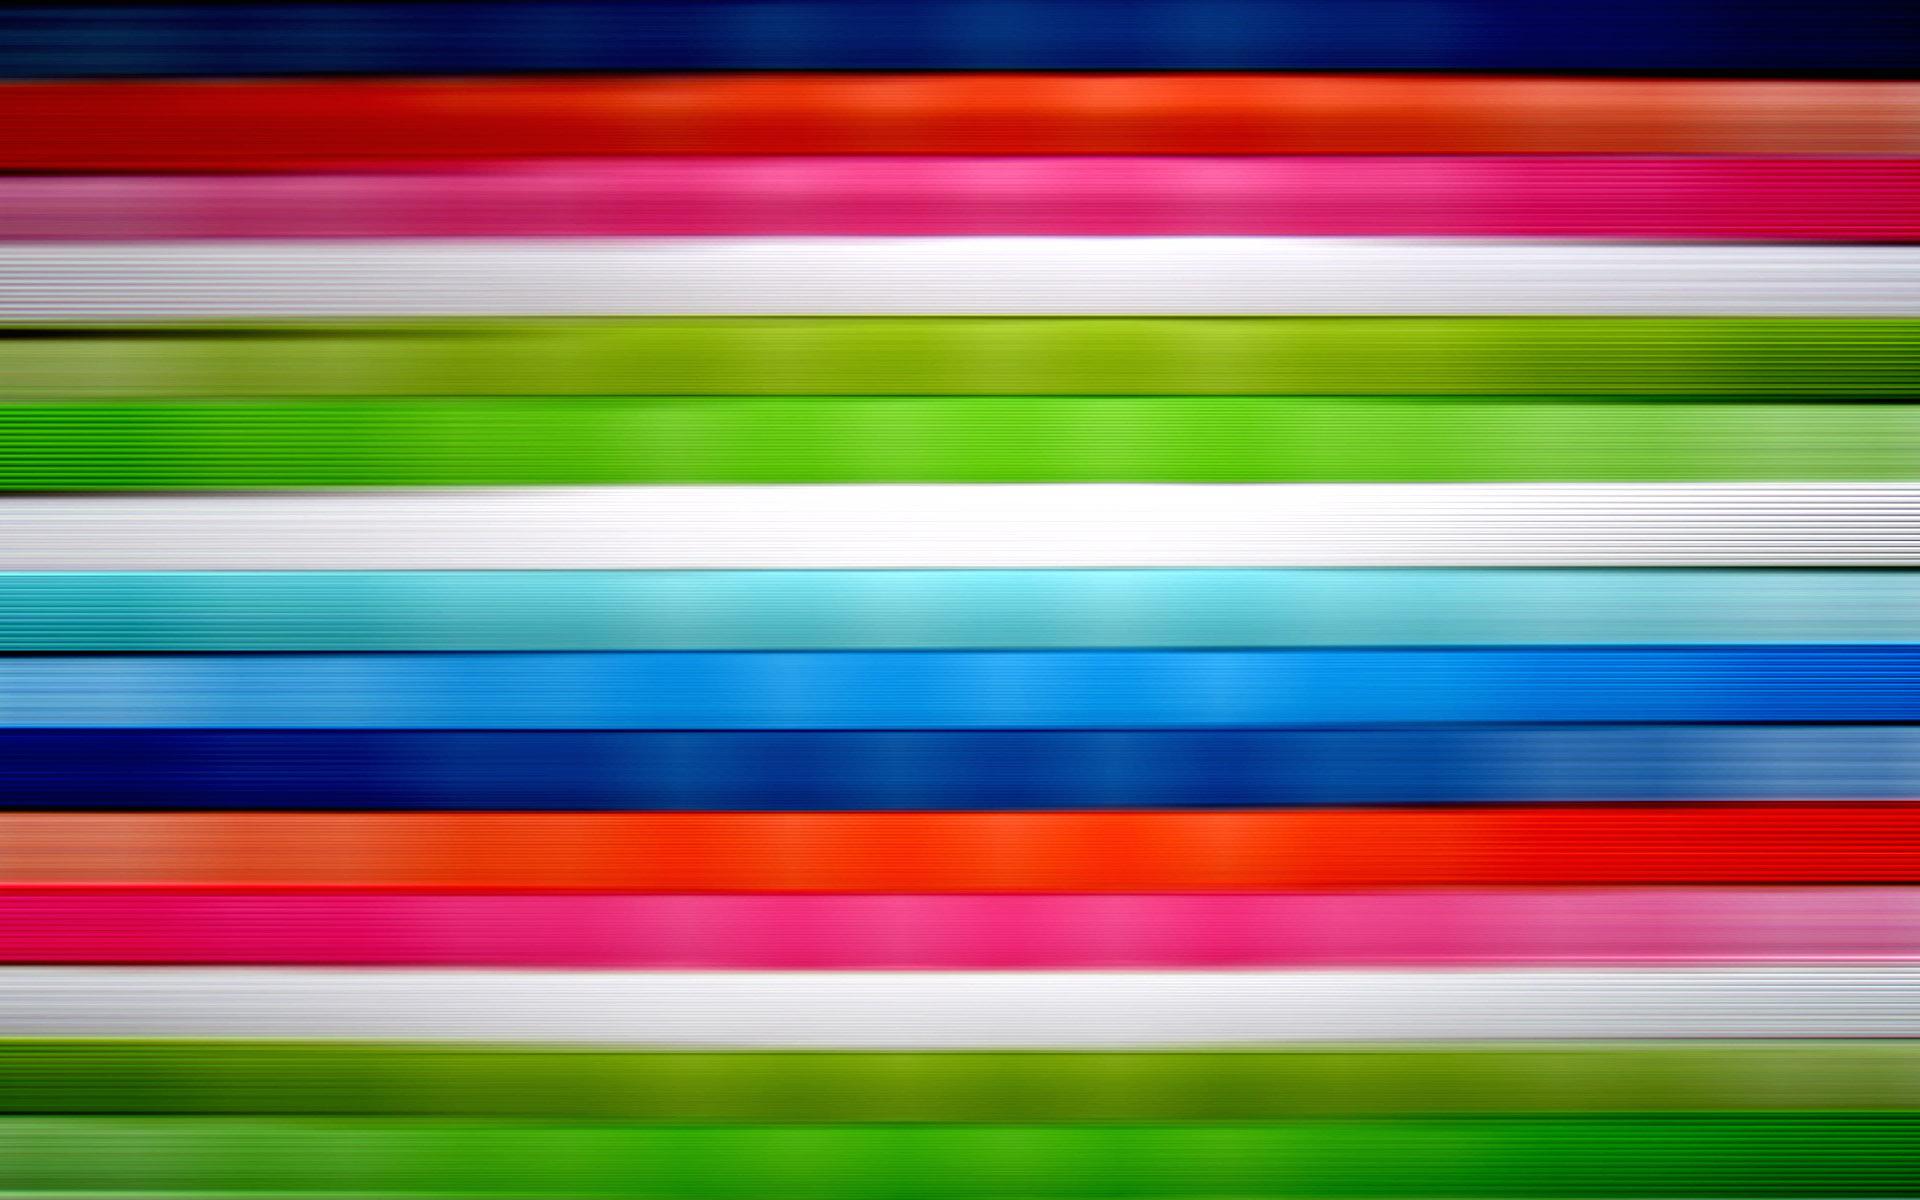 Vivid Colors Wallpapers HD Wallpapers 1920x1200